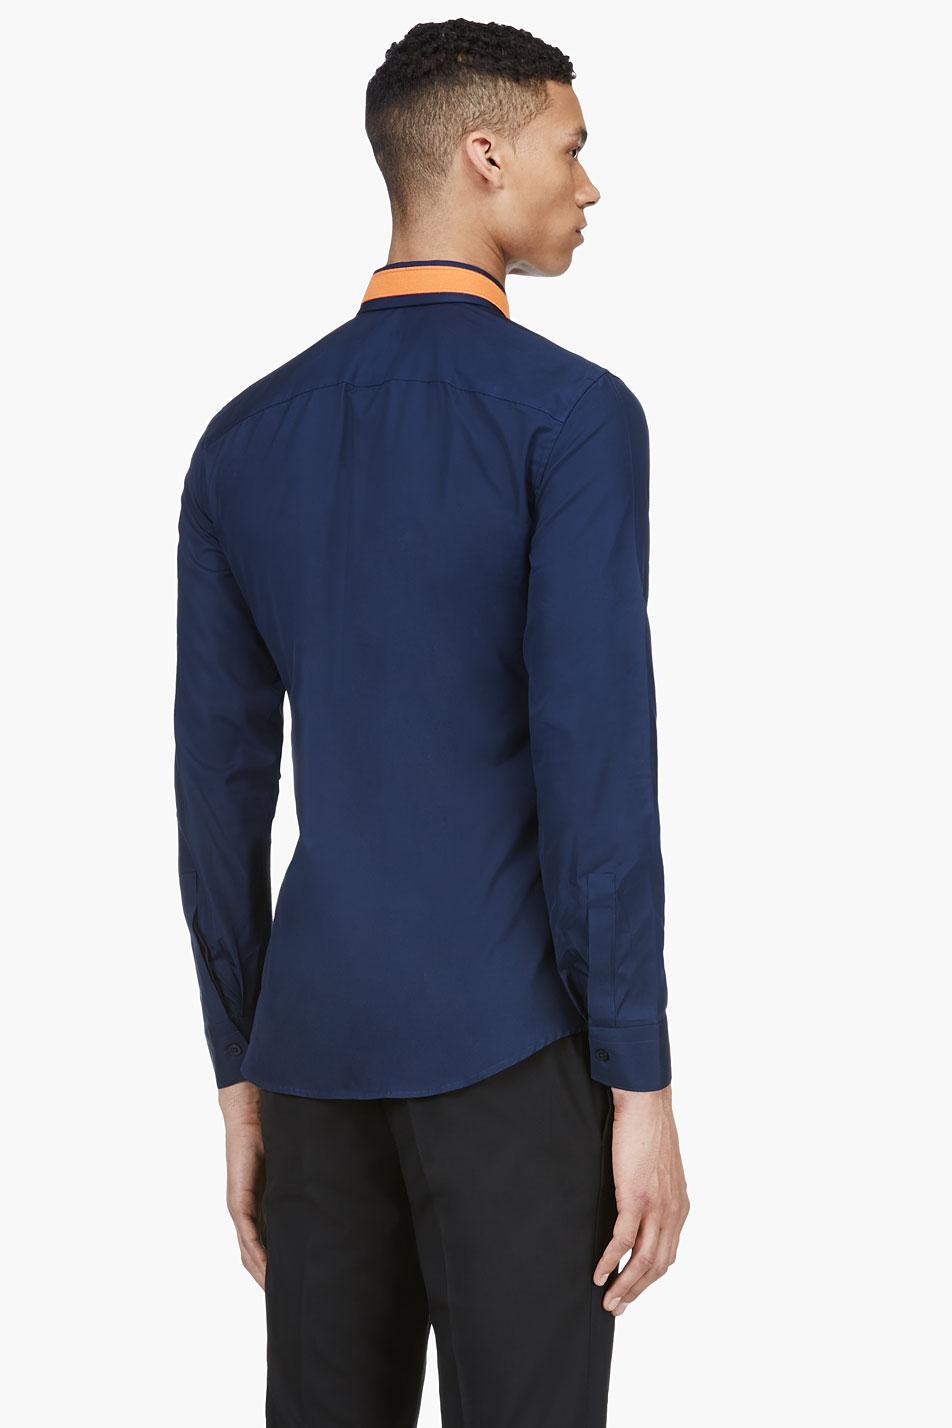 Star Appliqué Collar navy dress shirt menswear 3